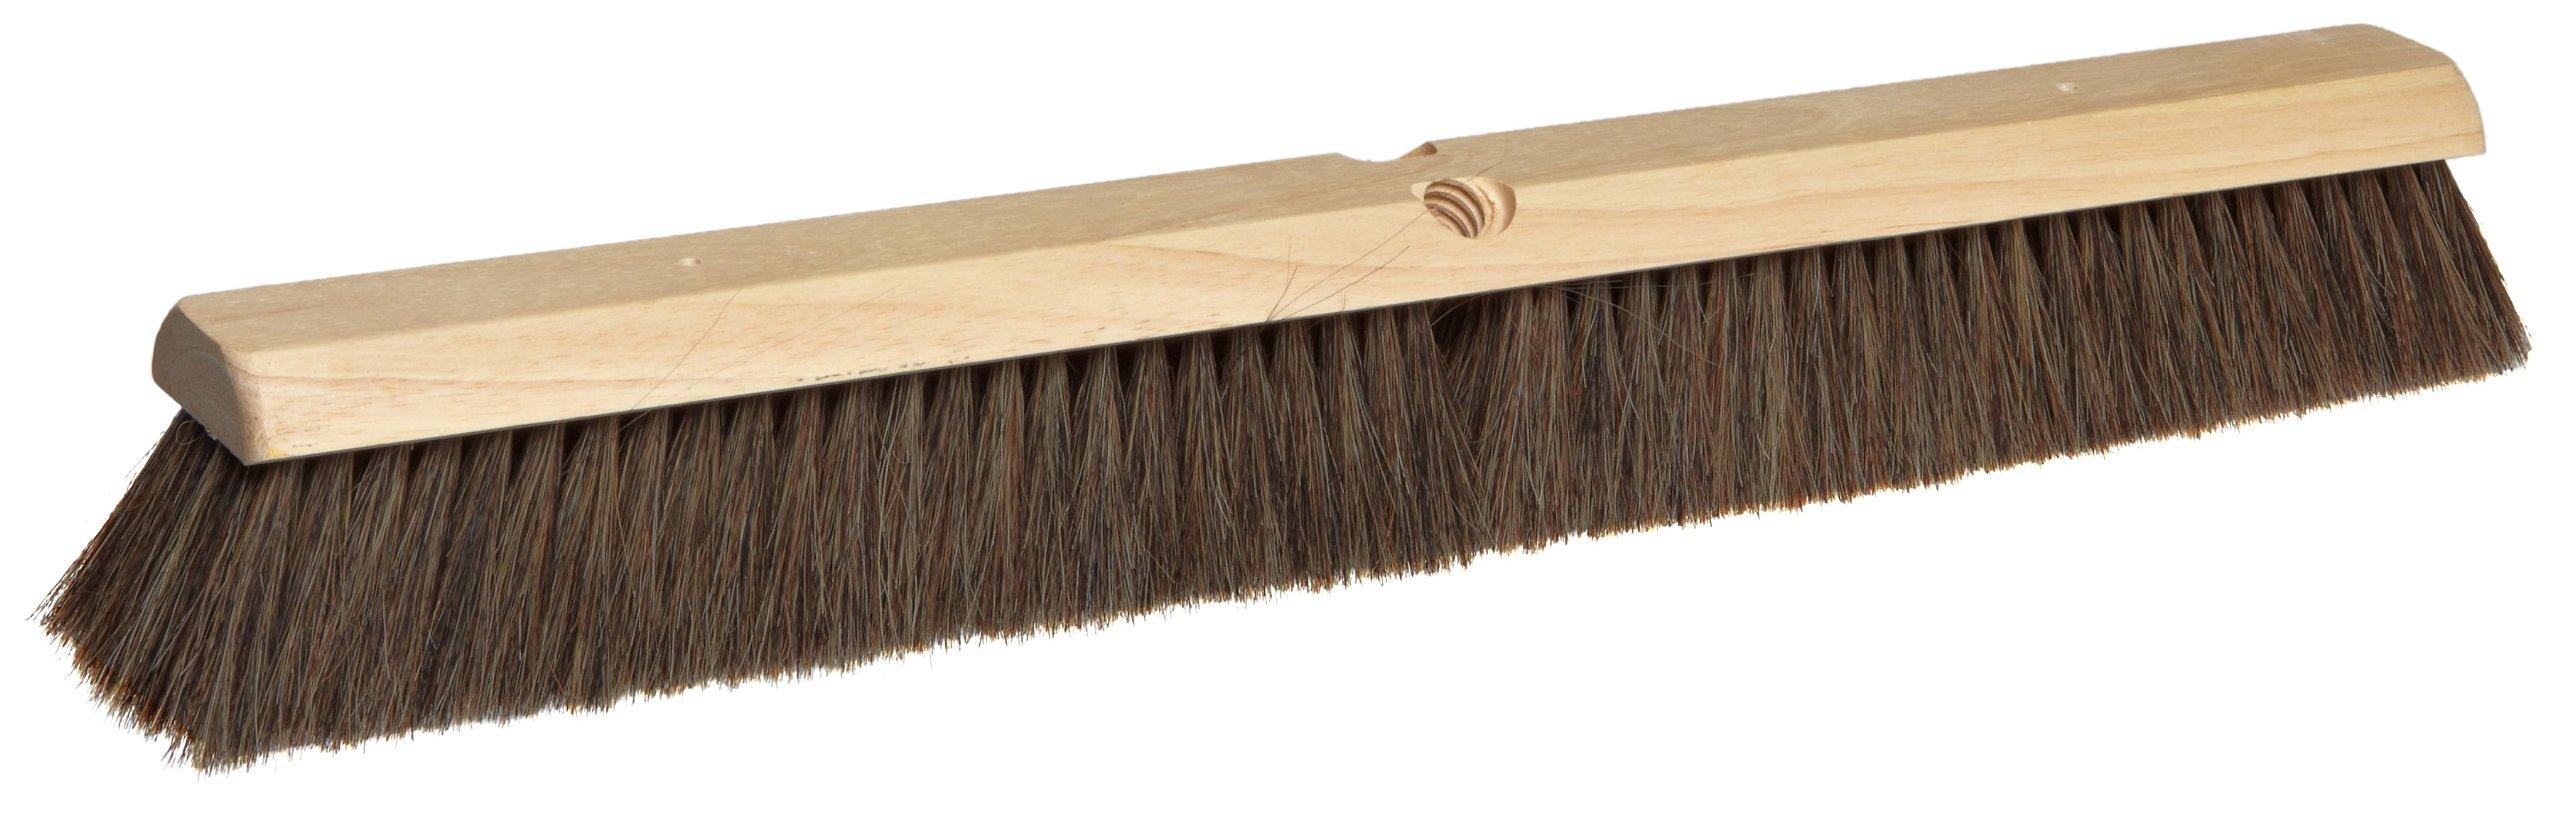 Magnolia Brush 2924 LH Line Concrete Finishing Brush, Horsehair Bristles, 2-1/2'' Trim, 24'' Length, Gray (Case of 12)